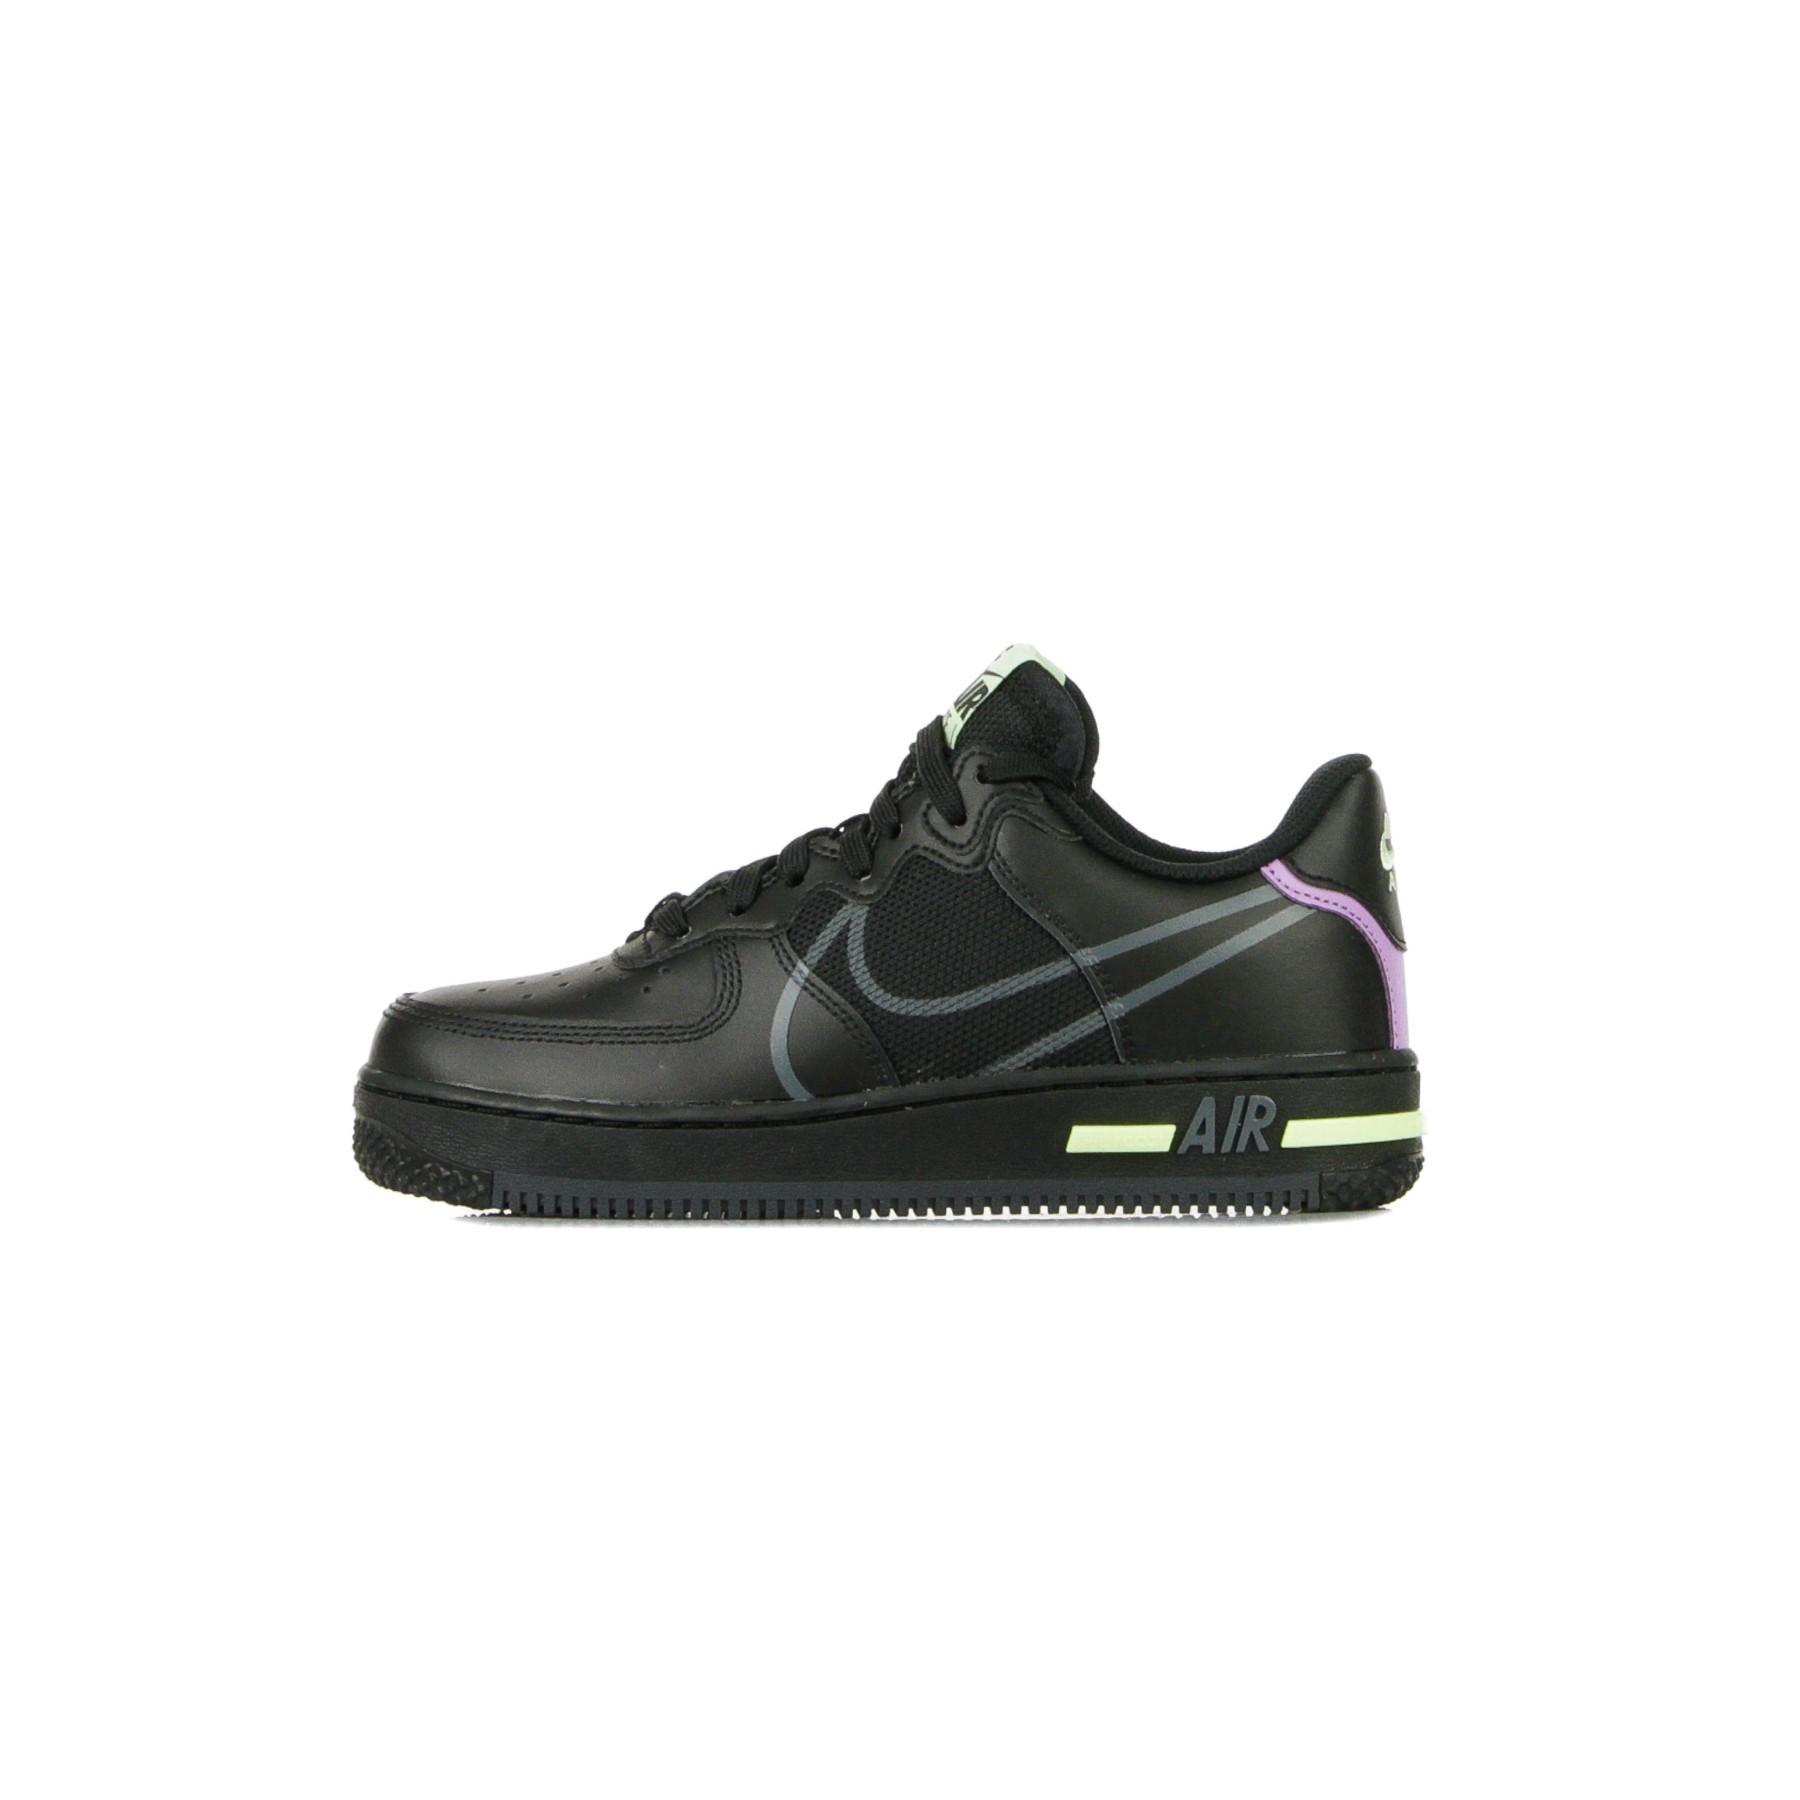 Nike Scarpa bassa bambino air force 1 react (gs) CD6960-001 | Atipi...